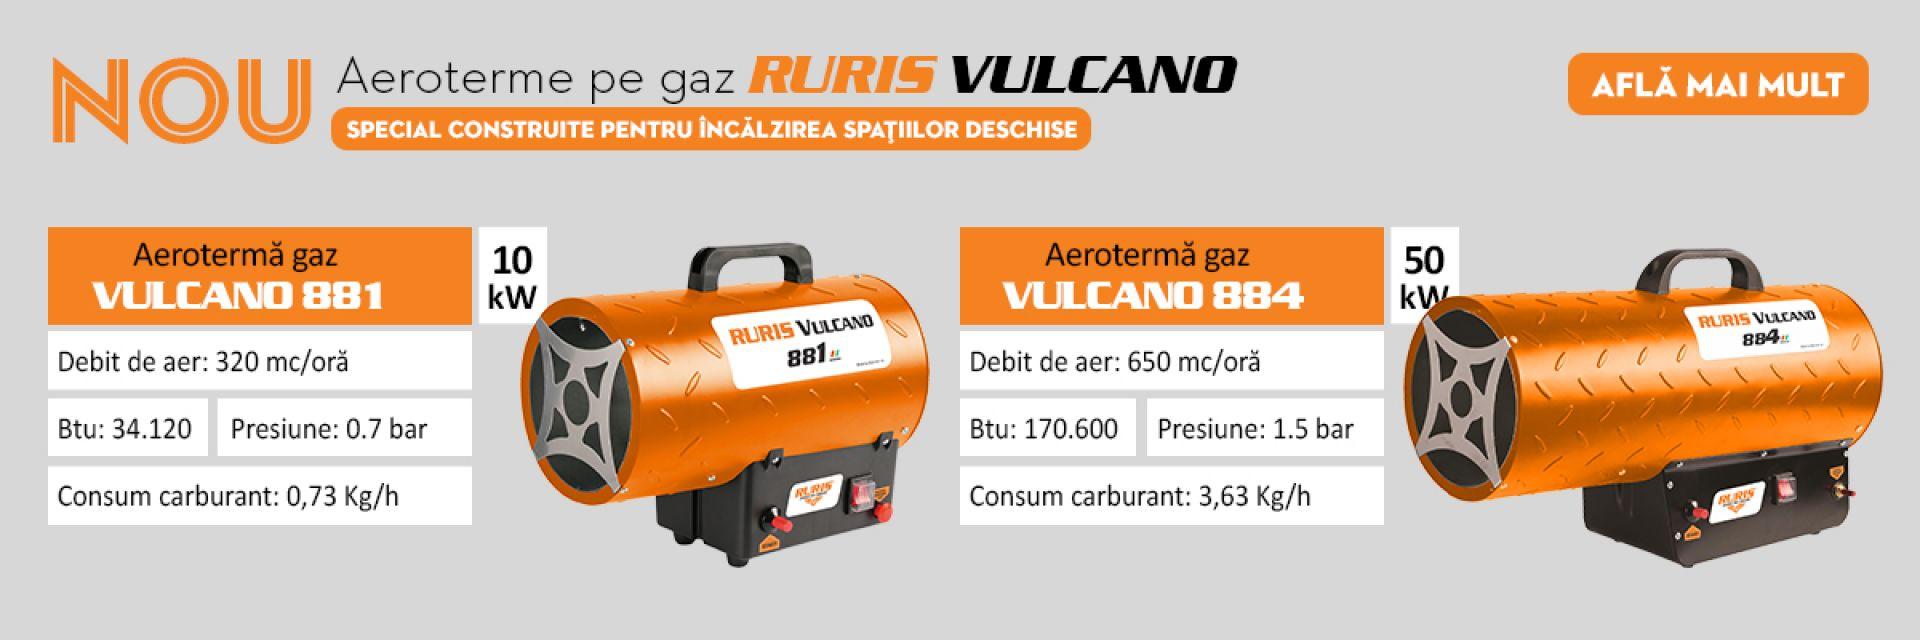 Aeroterme gaz